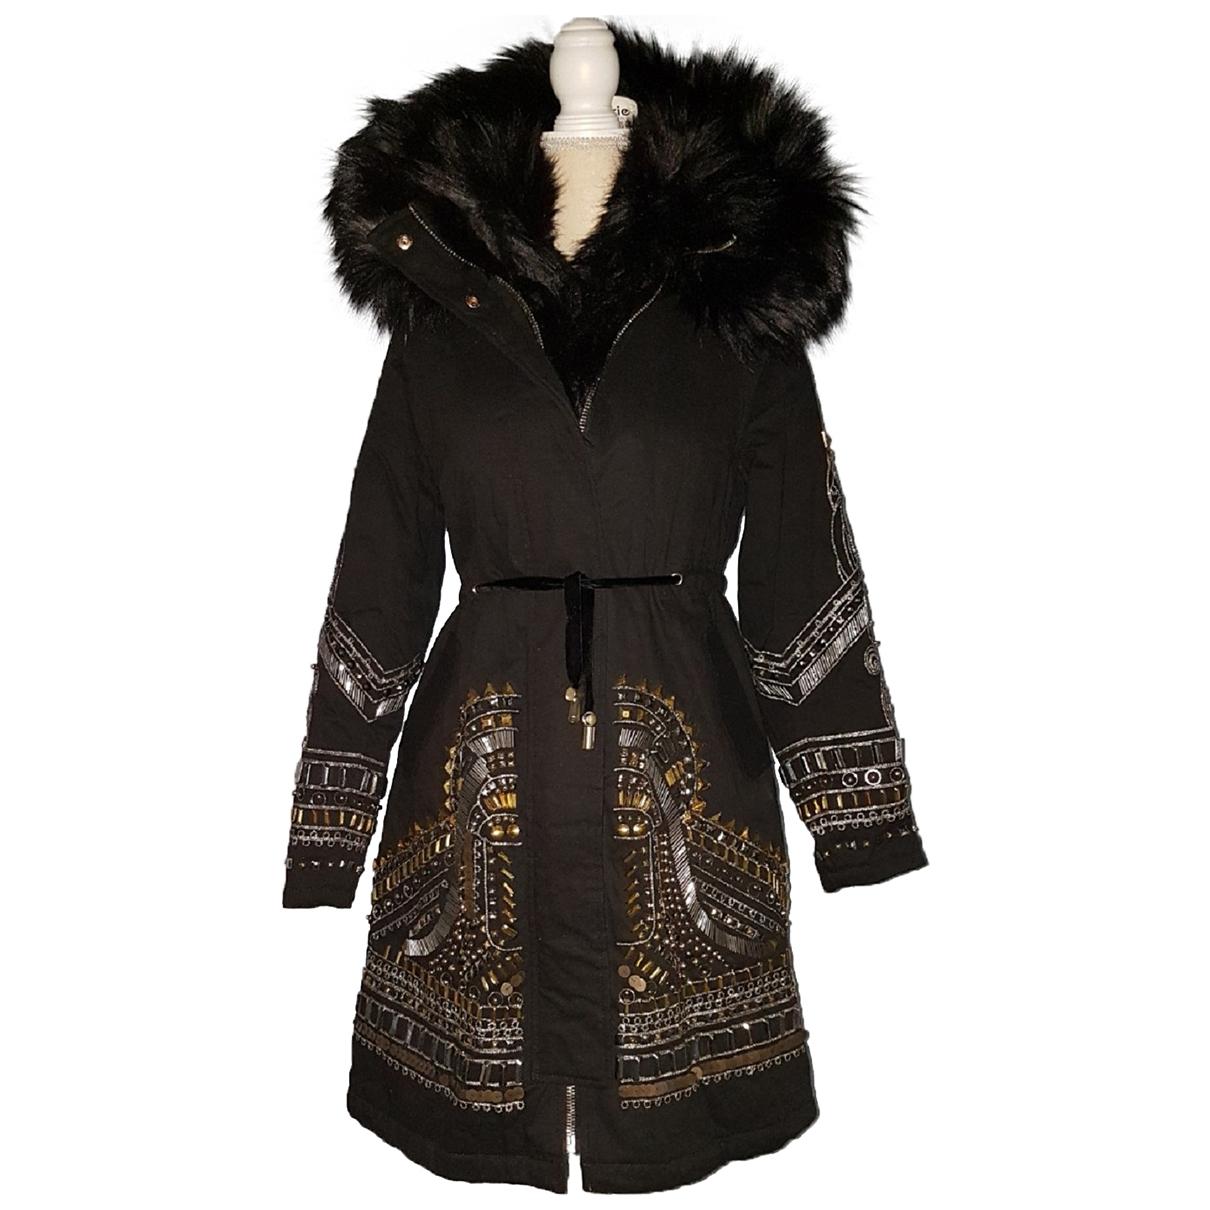 River Island \N Cotton coat for Women S International